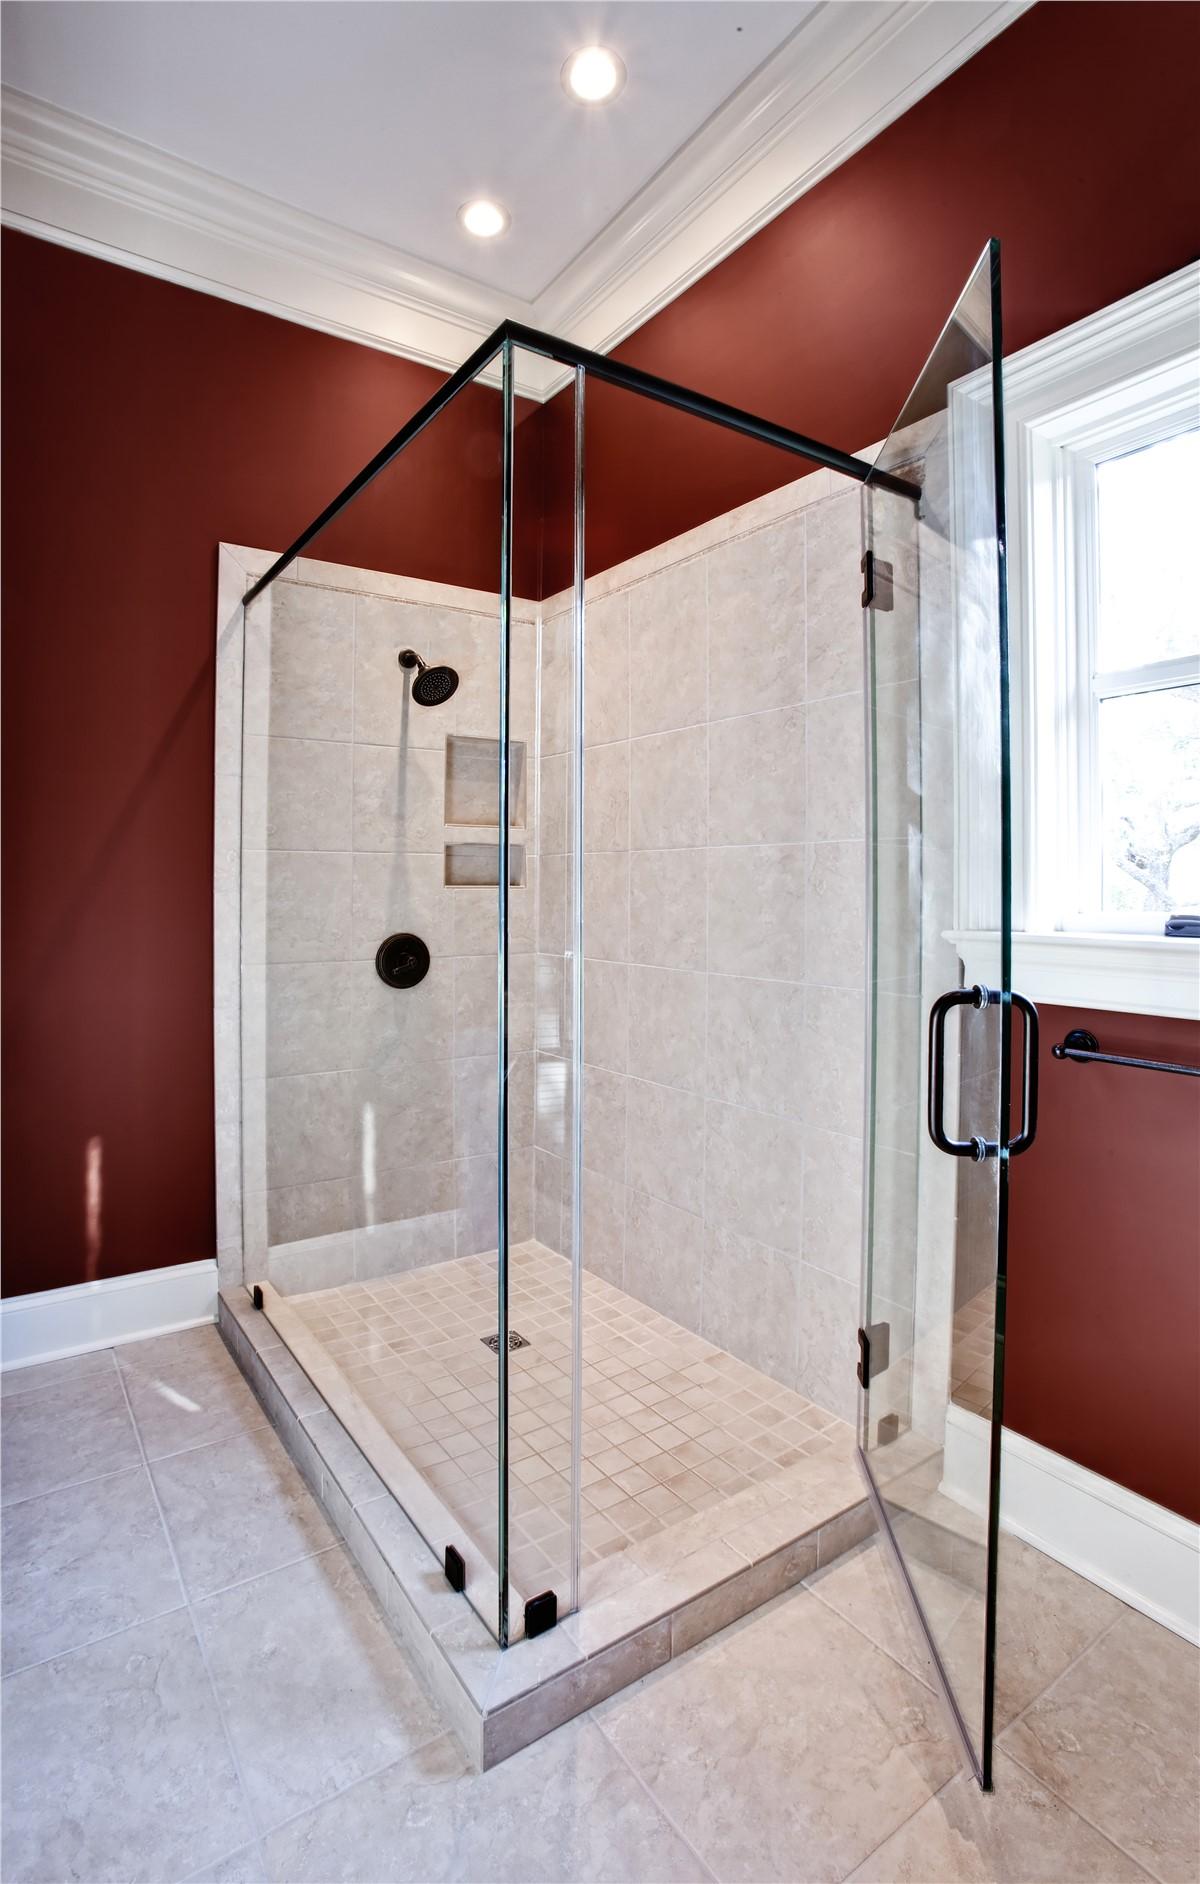 Shower Remodel Pittsburgh Bathroom Remodeling Legacy Remodeling - Bathroom remodeling pittsburgh